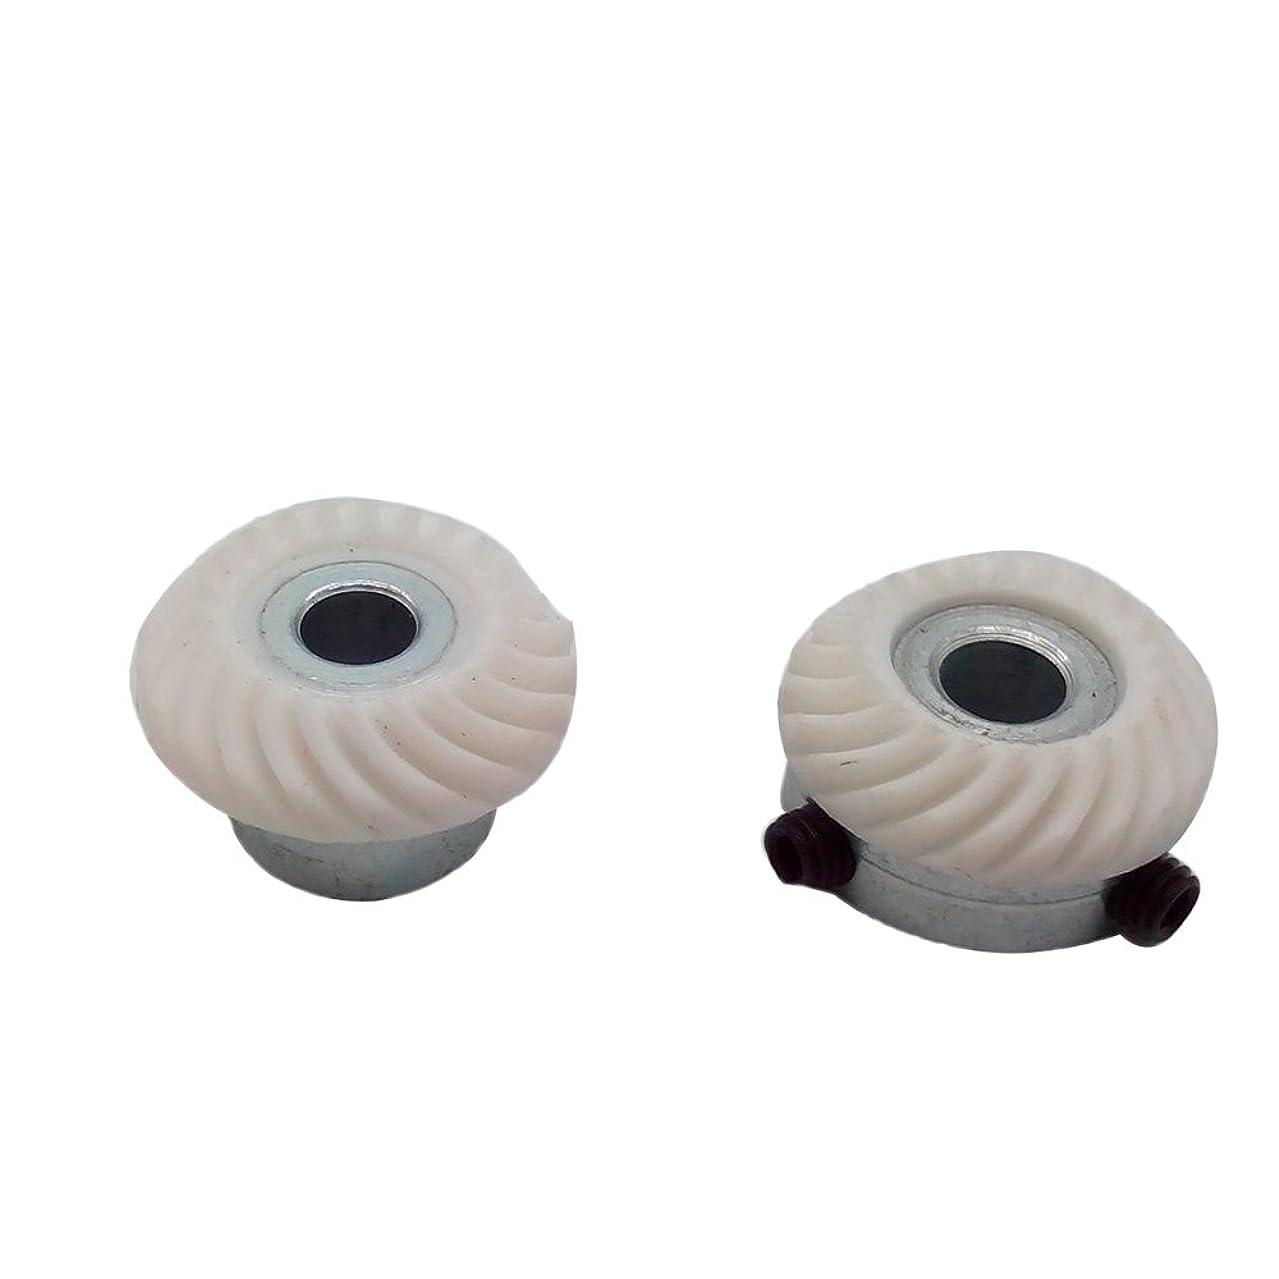 HONEYSEW Bevel Angle Gear Set For Singer 600 series 1200 2000 4552-4623 6233-6268 7028 9005 GEAR # 382980